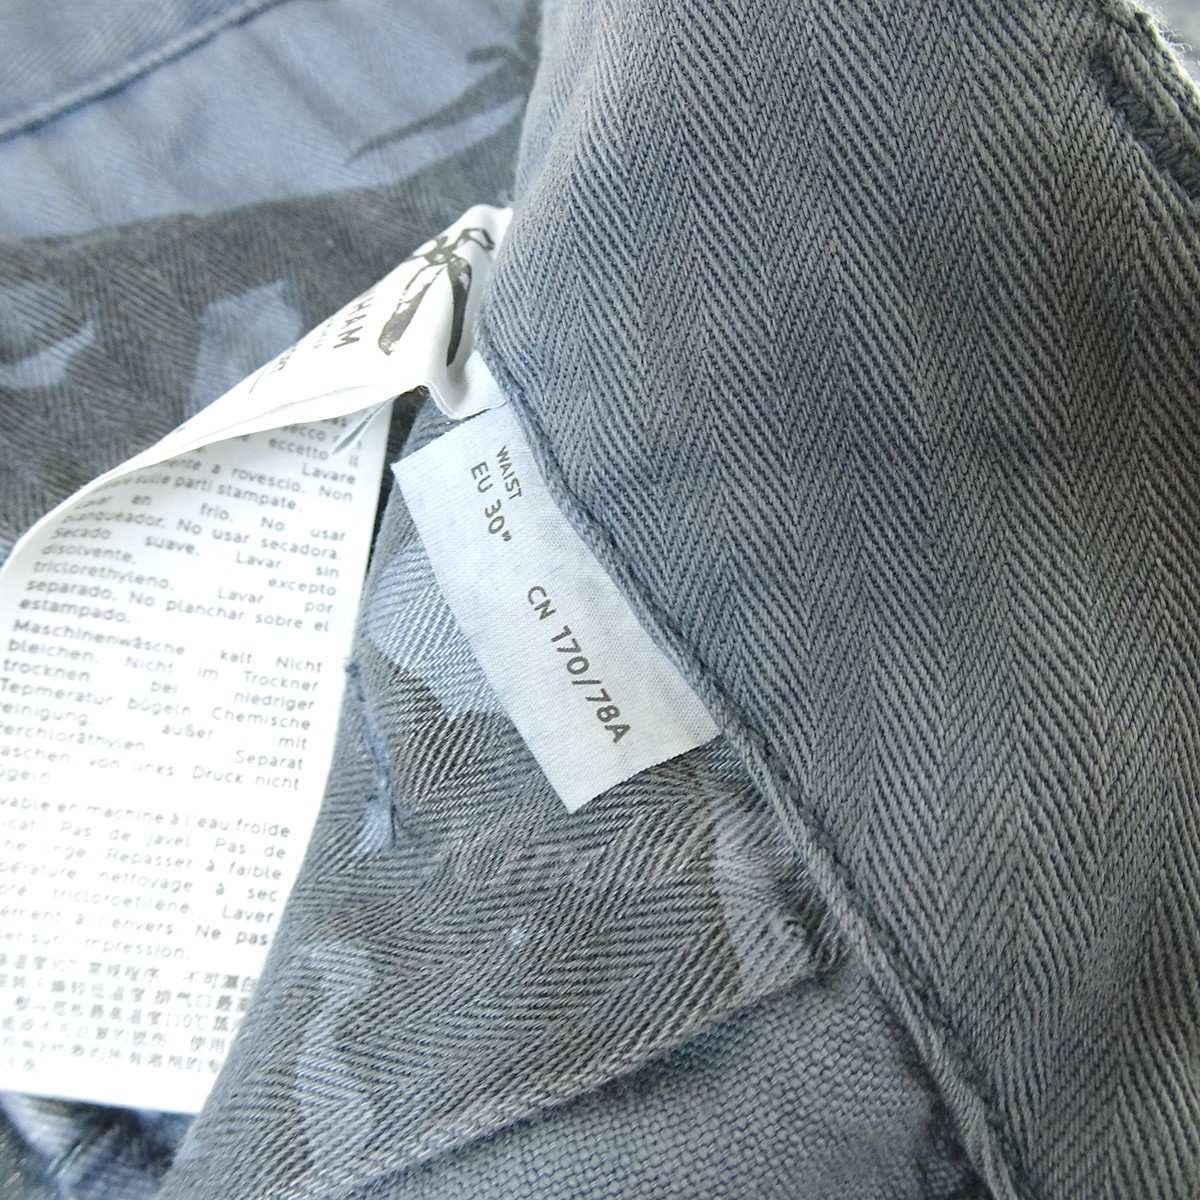 DENHAM NATO SHORT ショートパンツ ブルー サイズ EU 30280520デンハム80wnvmN